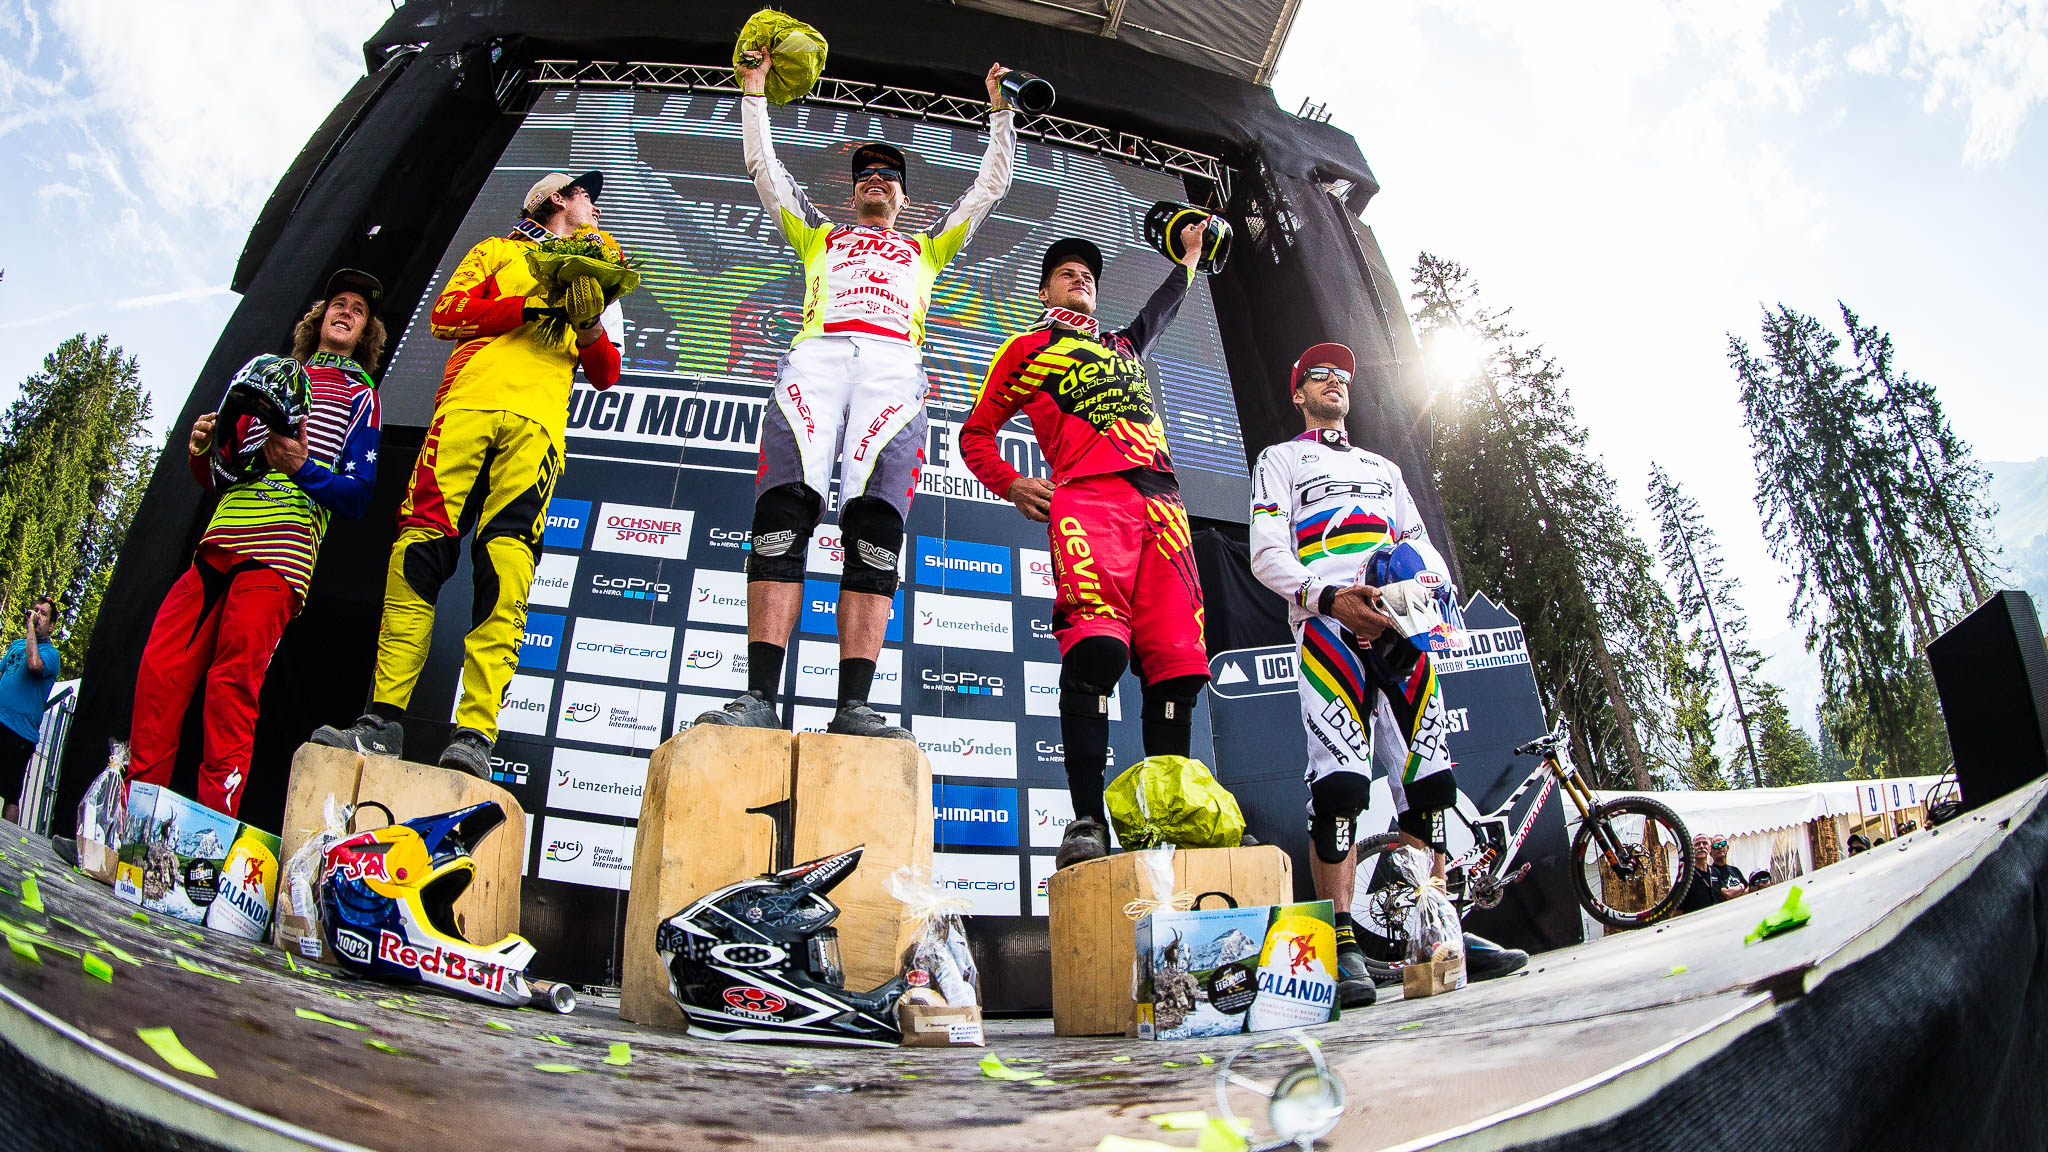 Lenzerheide_UCI_World_Cup_DH_2015_final_PodiumElite_Copyright_Antonio_Obregon_VojoMag